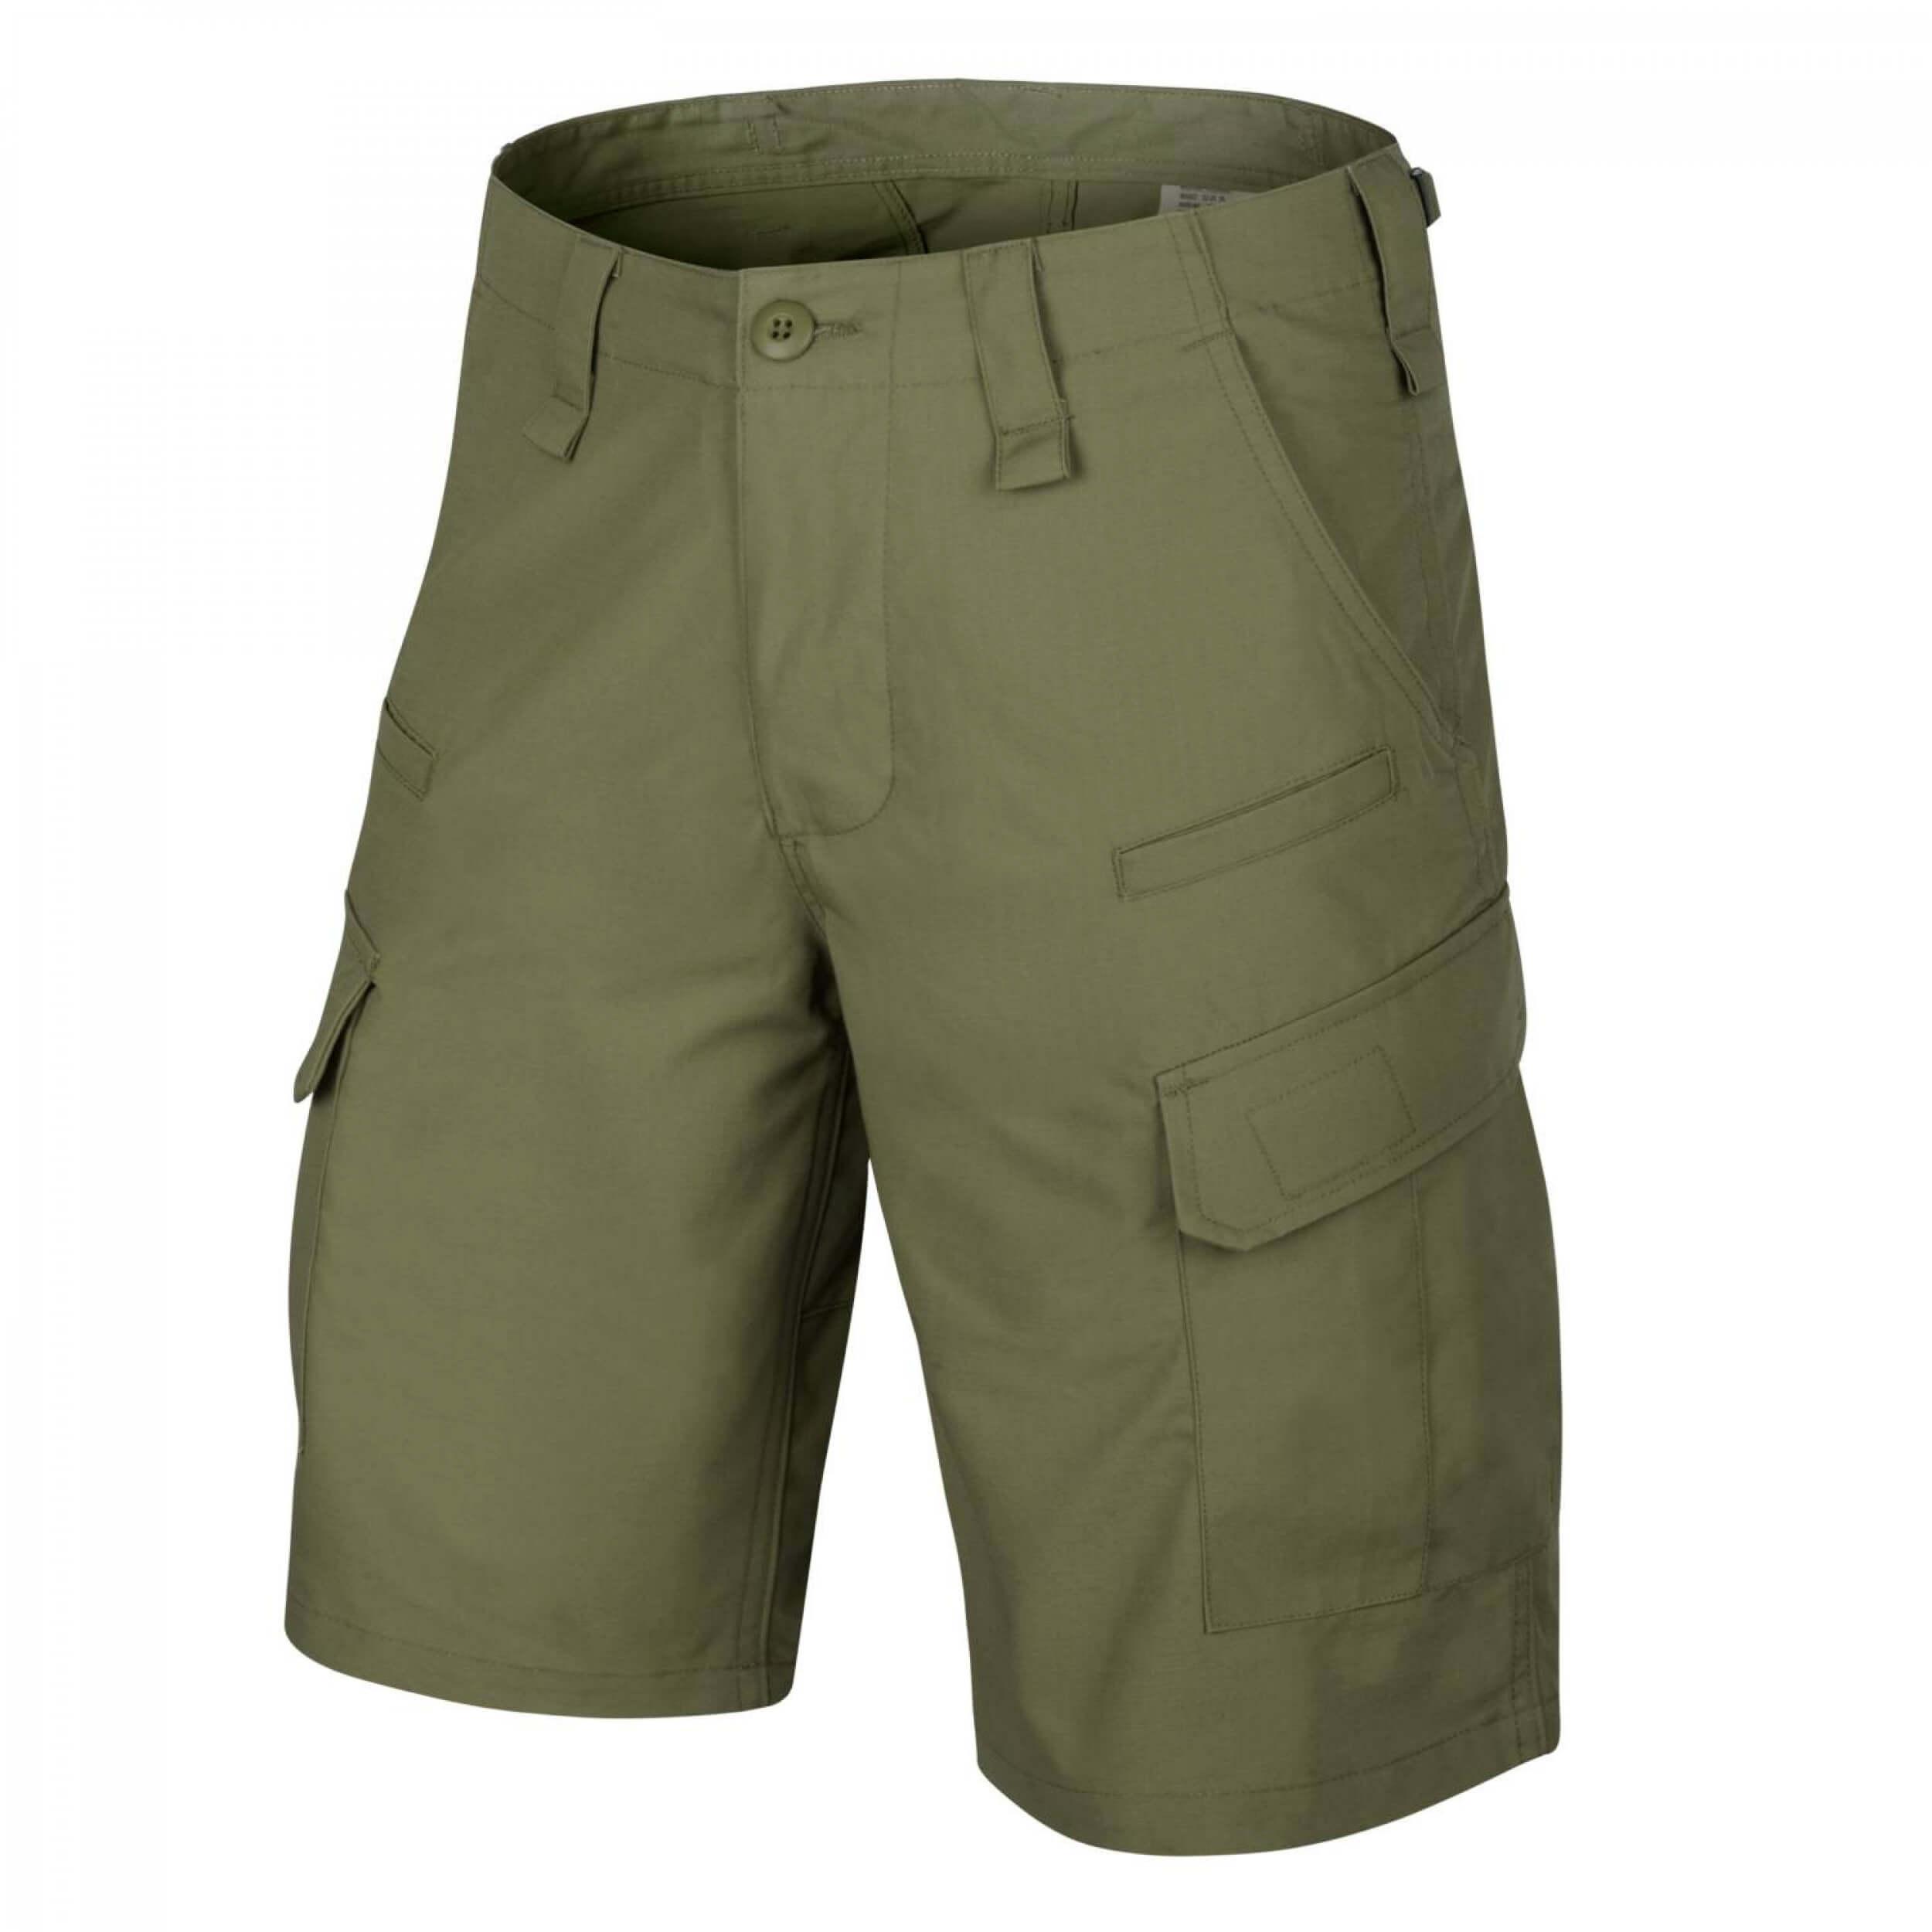 Helikon-Tex CPU Shorts - PolyCotton Ripstop - Olive Green